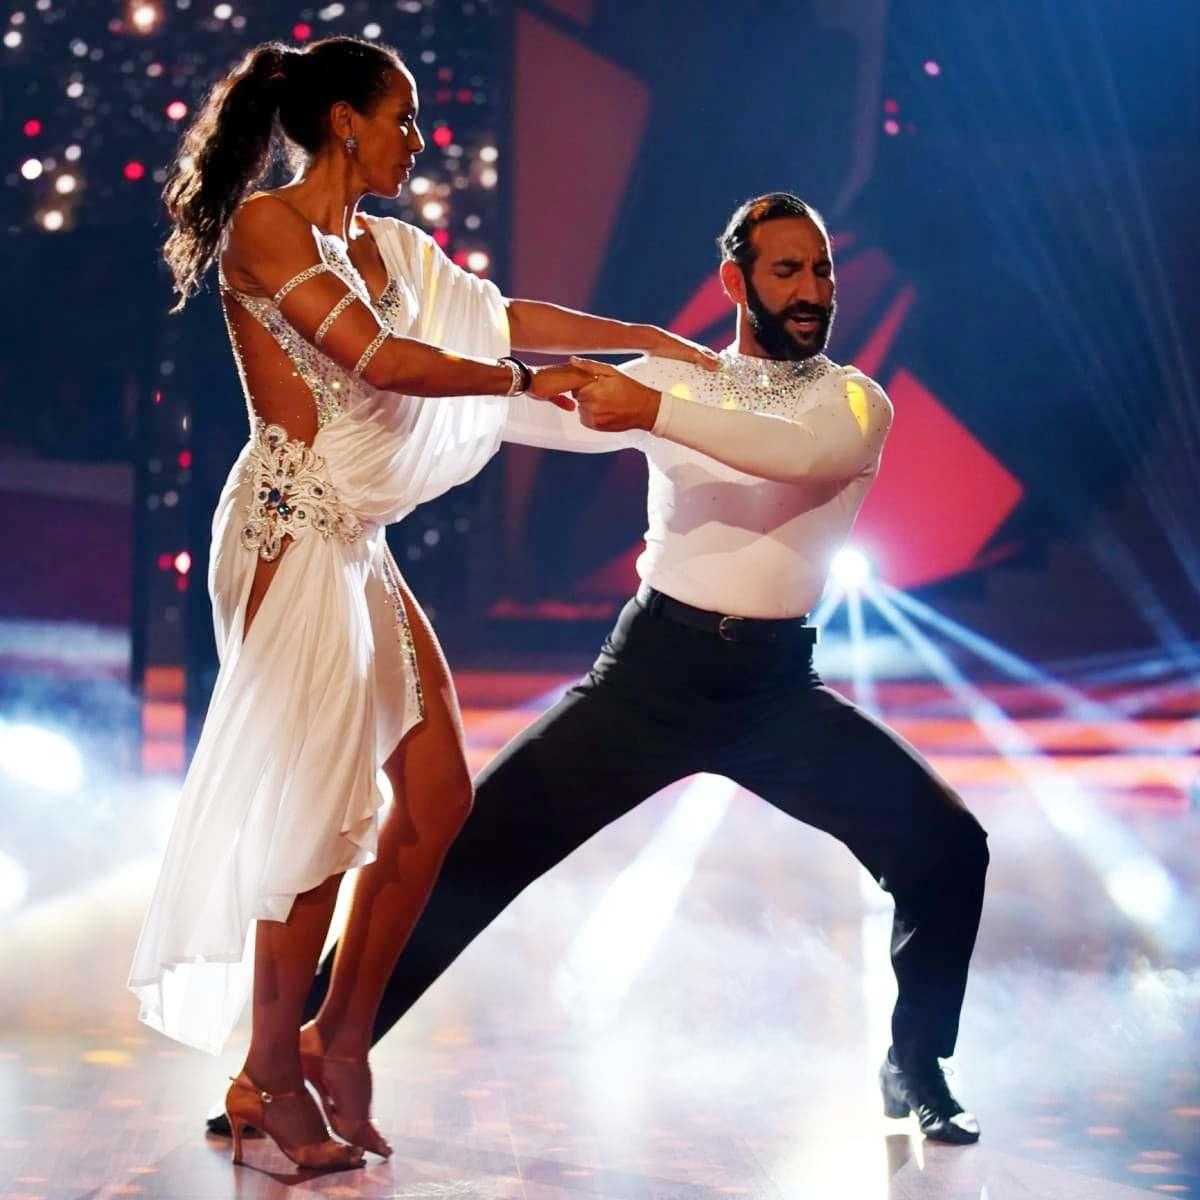 Barbara Becker - Massimo Sinato bei Let's dance 2019 am 5.4.2019